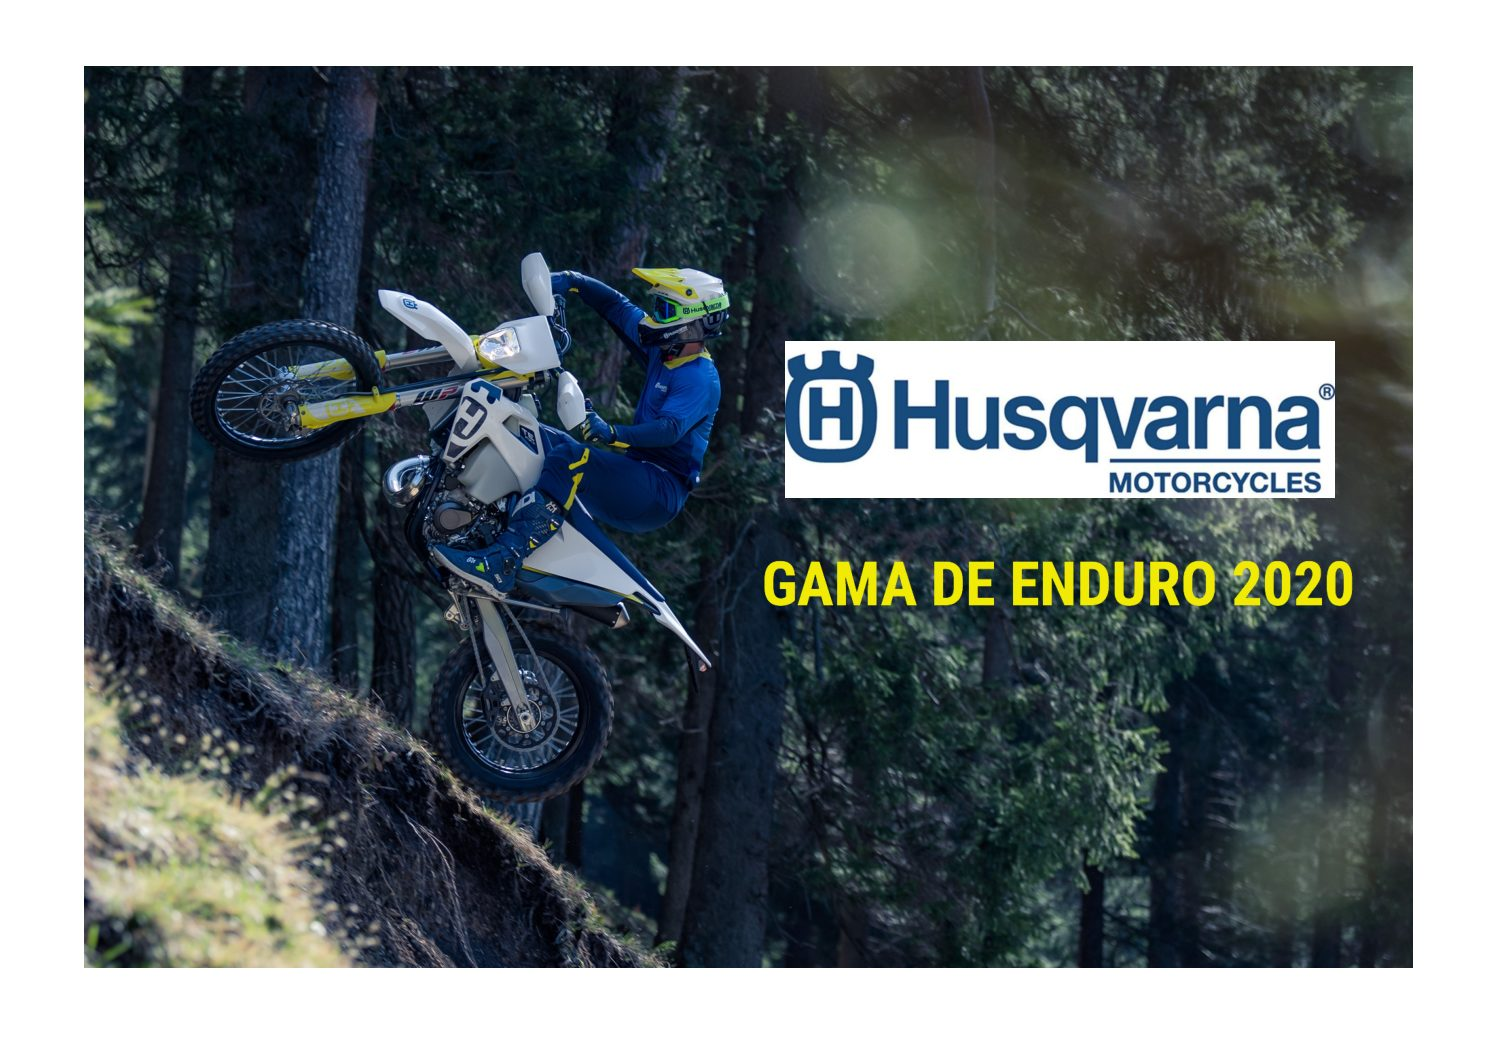 Husqvarna – Apresenta a nova gama Enduro 2020 thumbnail